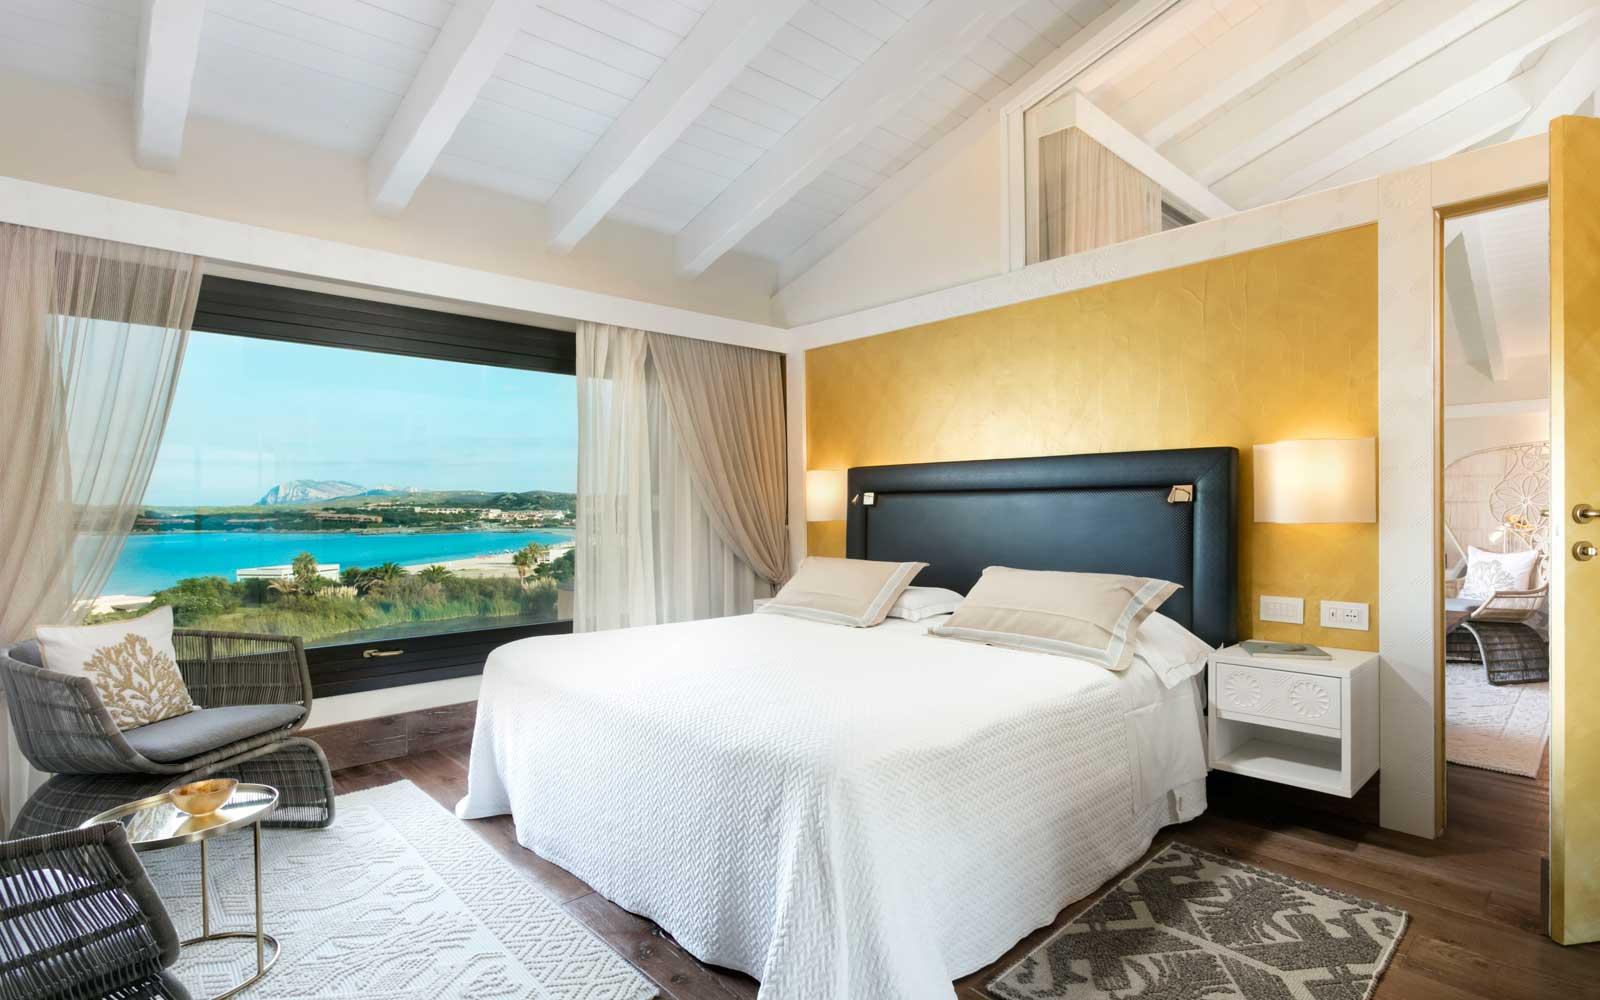 Suite at Hotel Abi D'oru